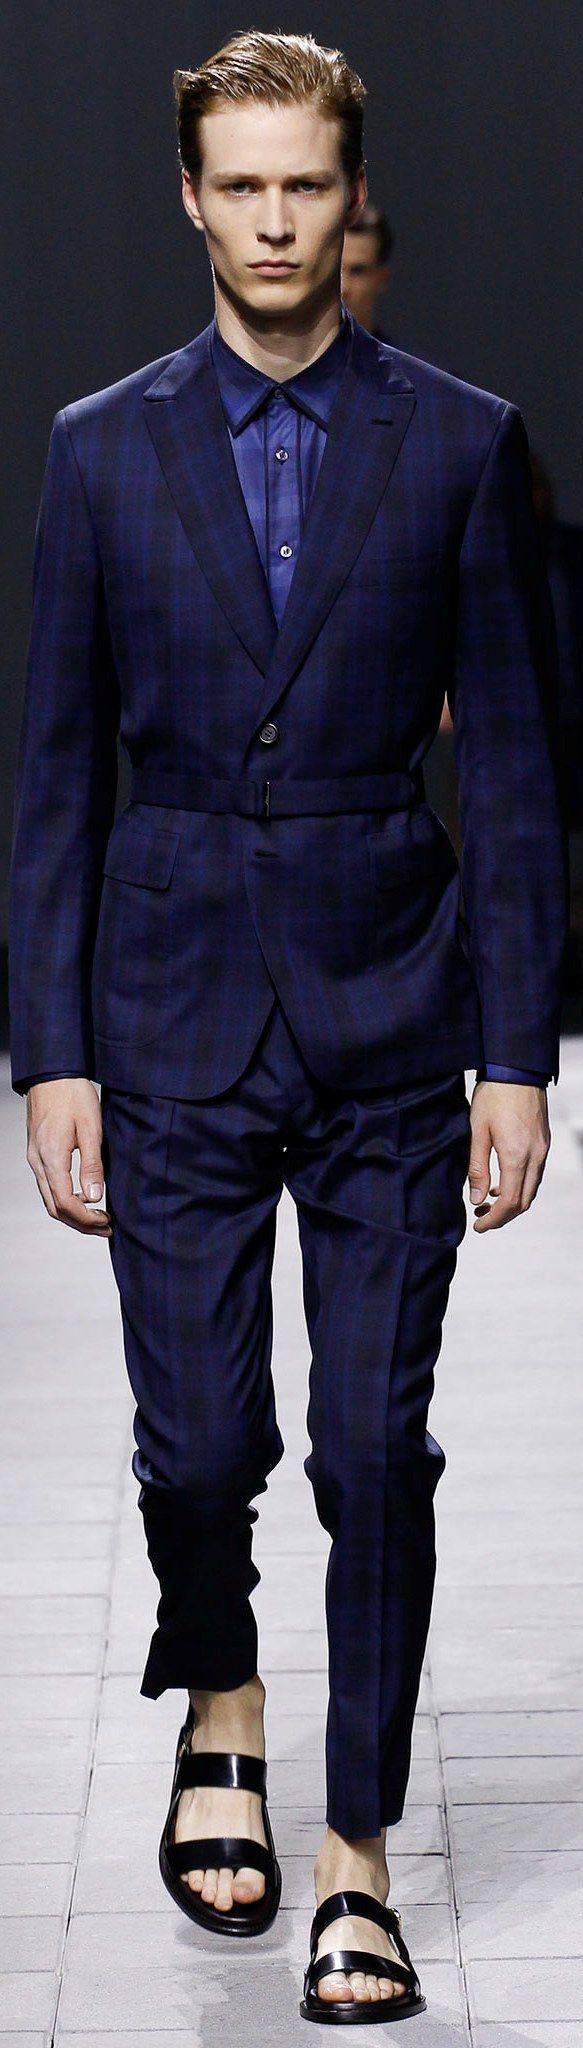 Brioni  Menswear  Spring   Italian Men's Fashion & Style   Moda Masculina   Shop at designerclothingfans.com